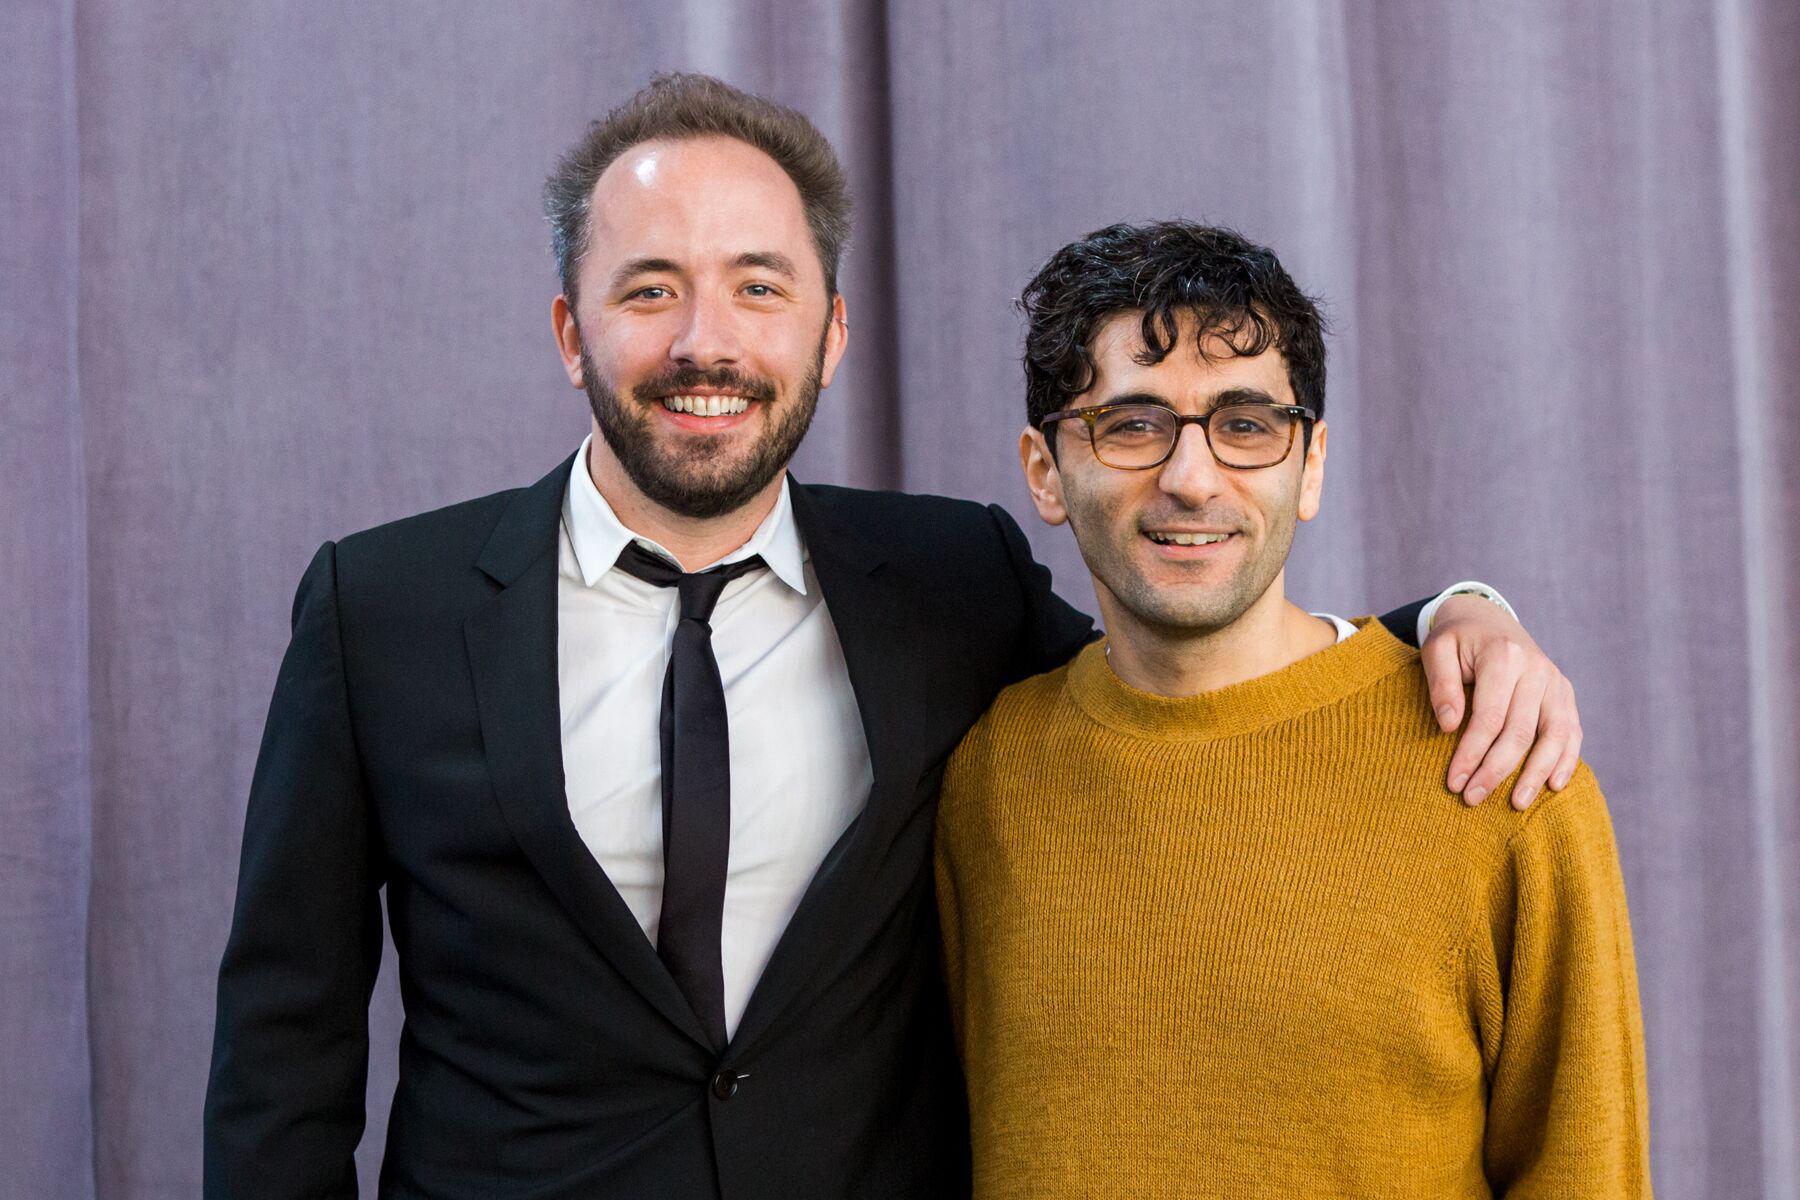 Drew Houston and Arash Ferdowsi in 2017